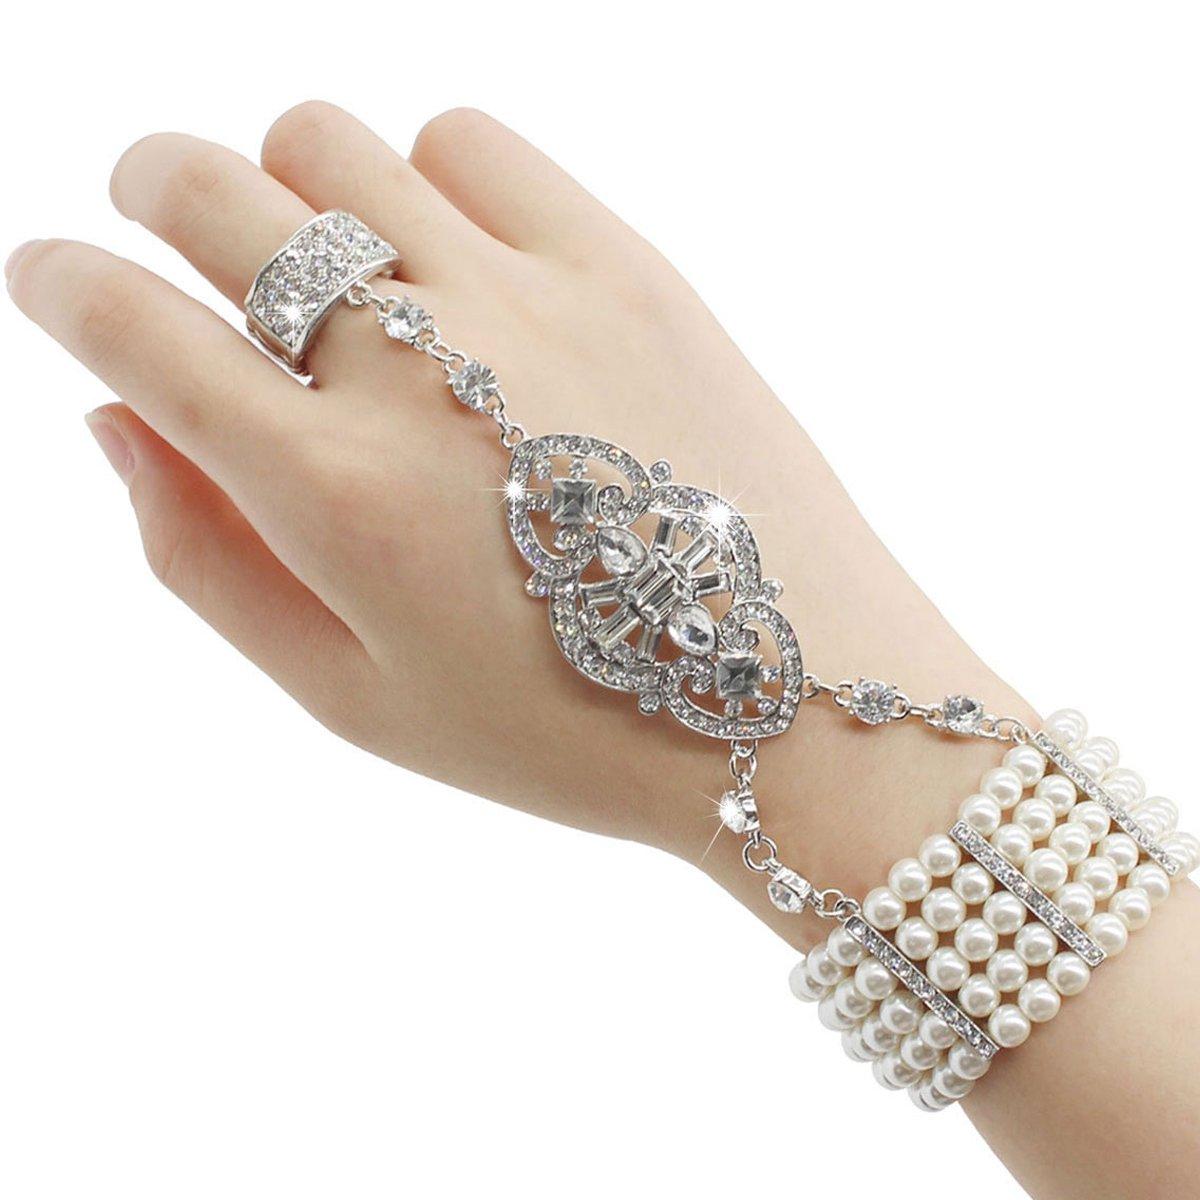 HAMIST 1920s Accessories Bracelet Ring Set Great Gatsby Adjustable Bracelet Art Deco For Women by HAMIST